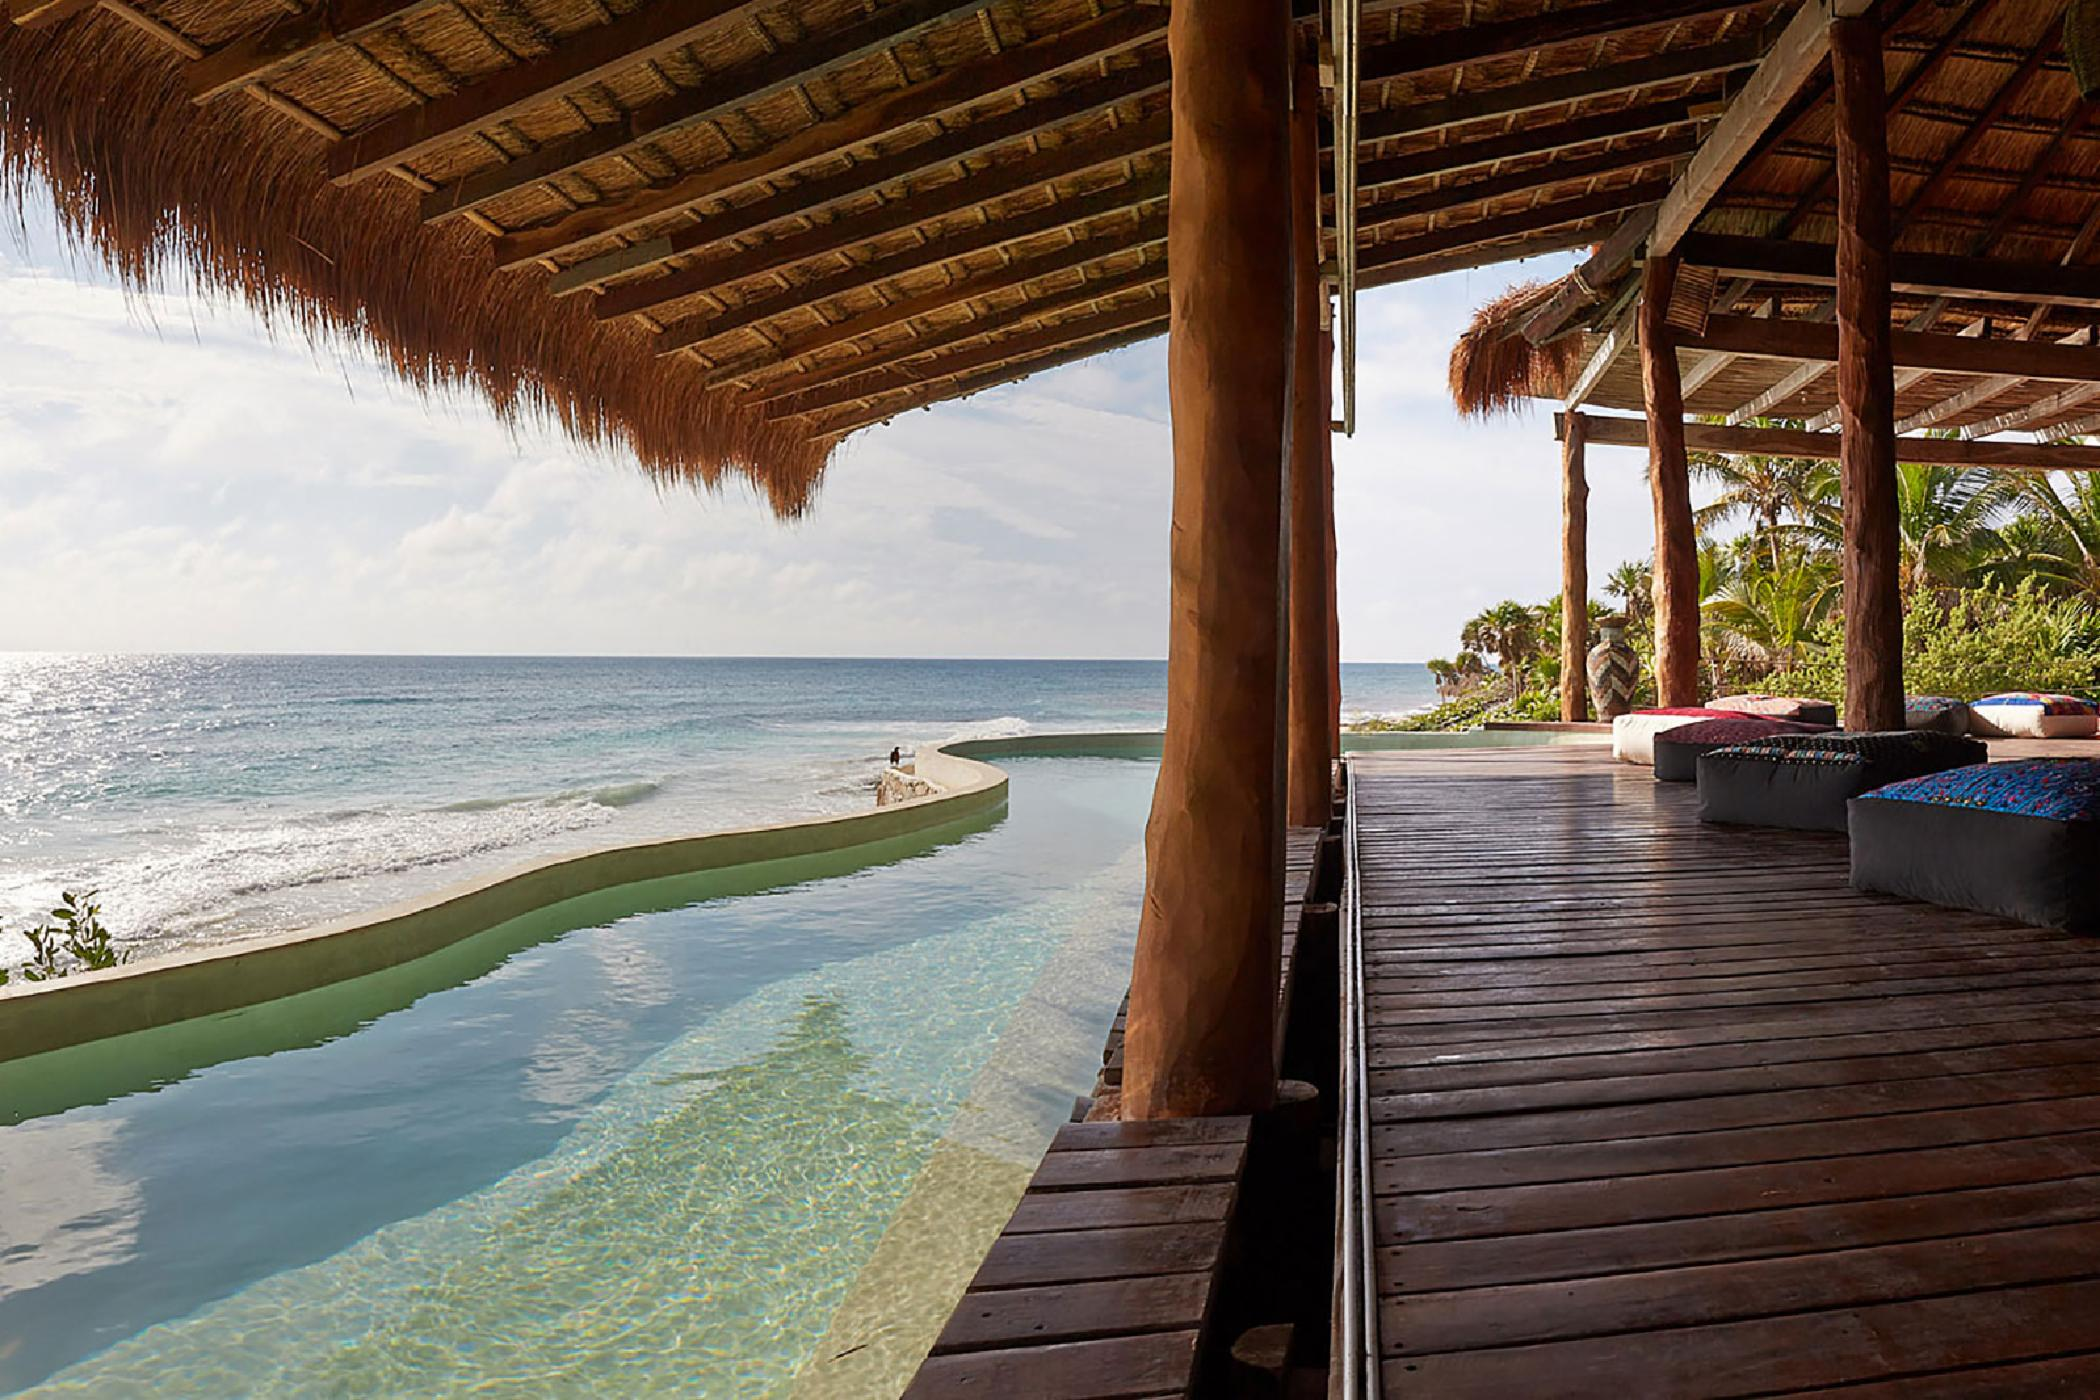 Maya_Luxe_Riviera_Maya_Luxury_Villas_Experiences_Hotel_Zone_Tulum_Beach_5_Bedrooms_Casa_Palapa_7.jpg